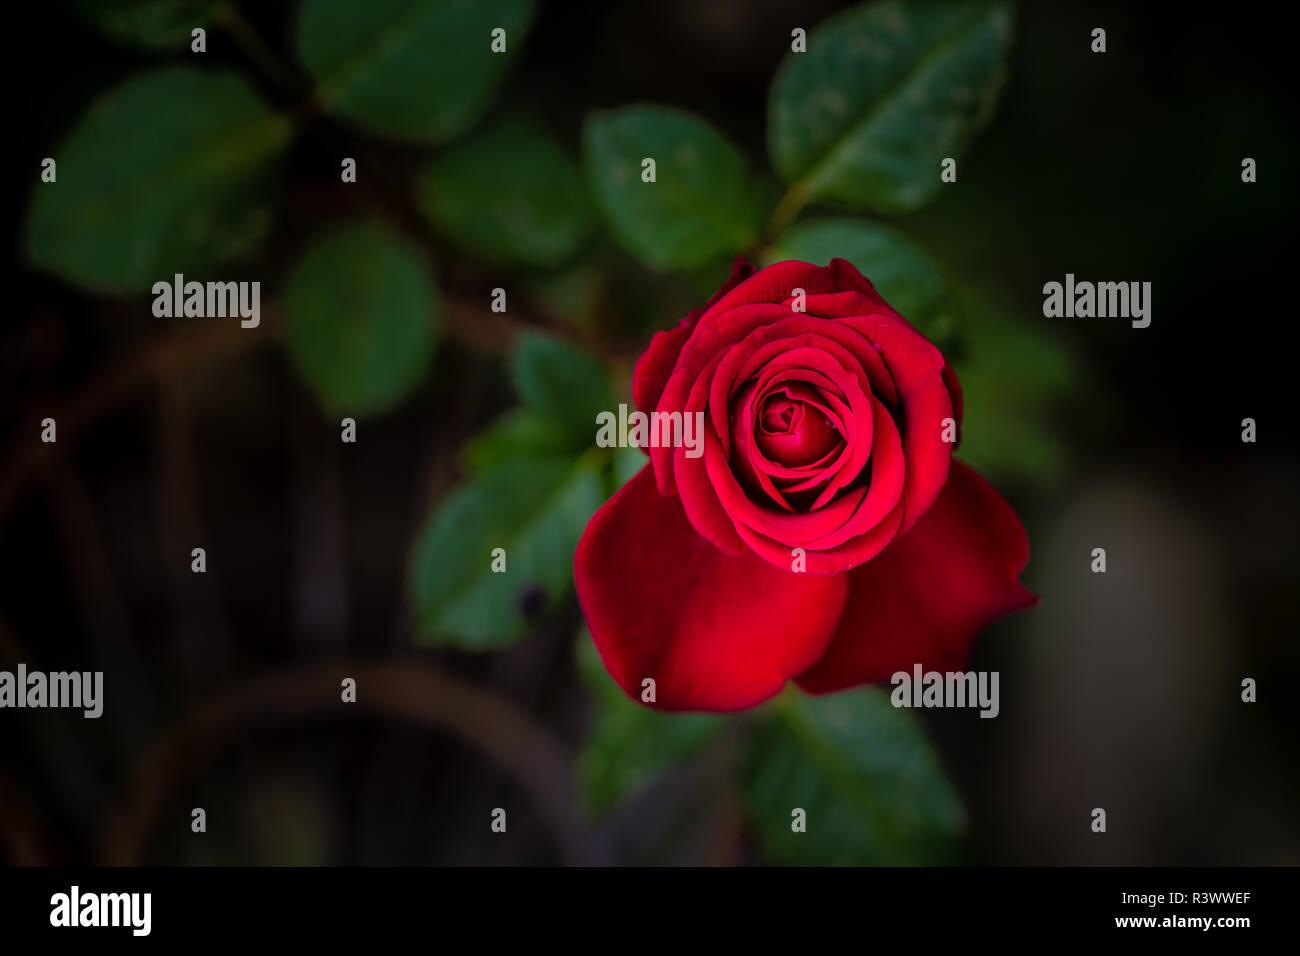 Rote Rose im Garten - Stock Image